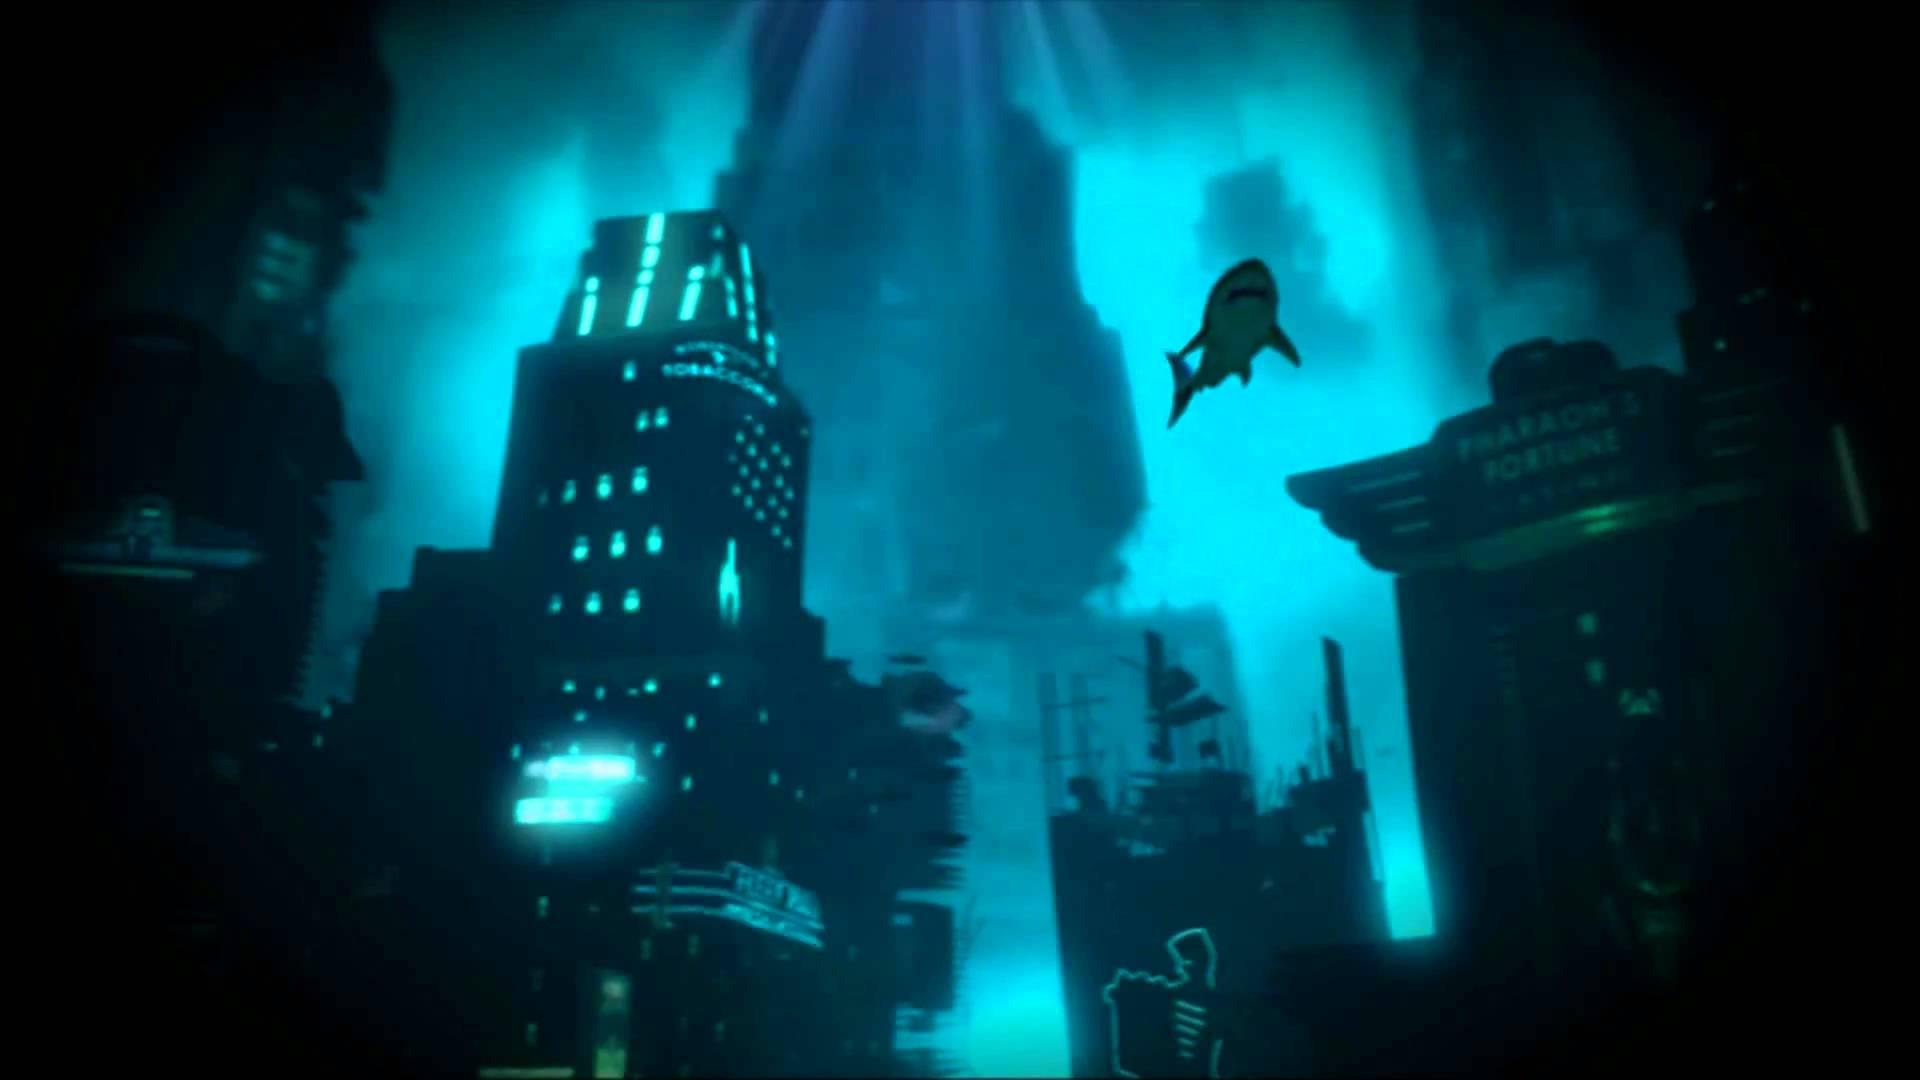 Fall Animated Wallpaper Windows 7 Bioshock Rapture Wallpaper 1920x1080 67280